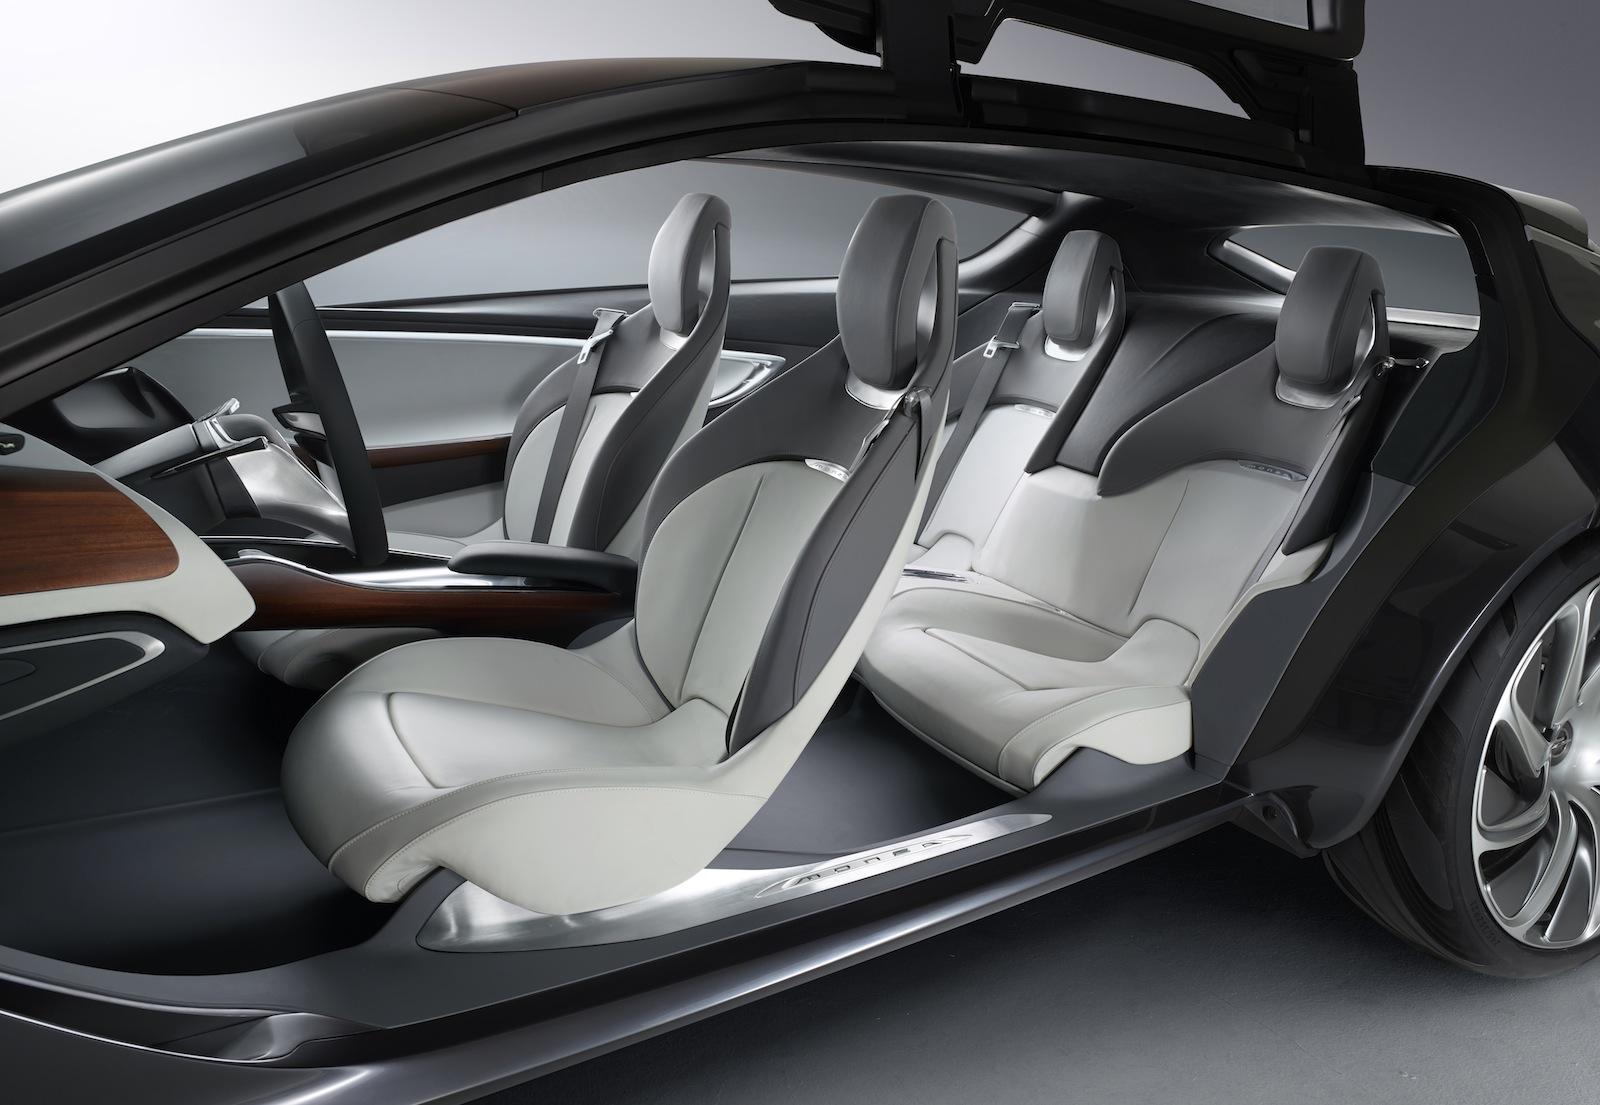 Opel monza concept four seat range extender revealed